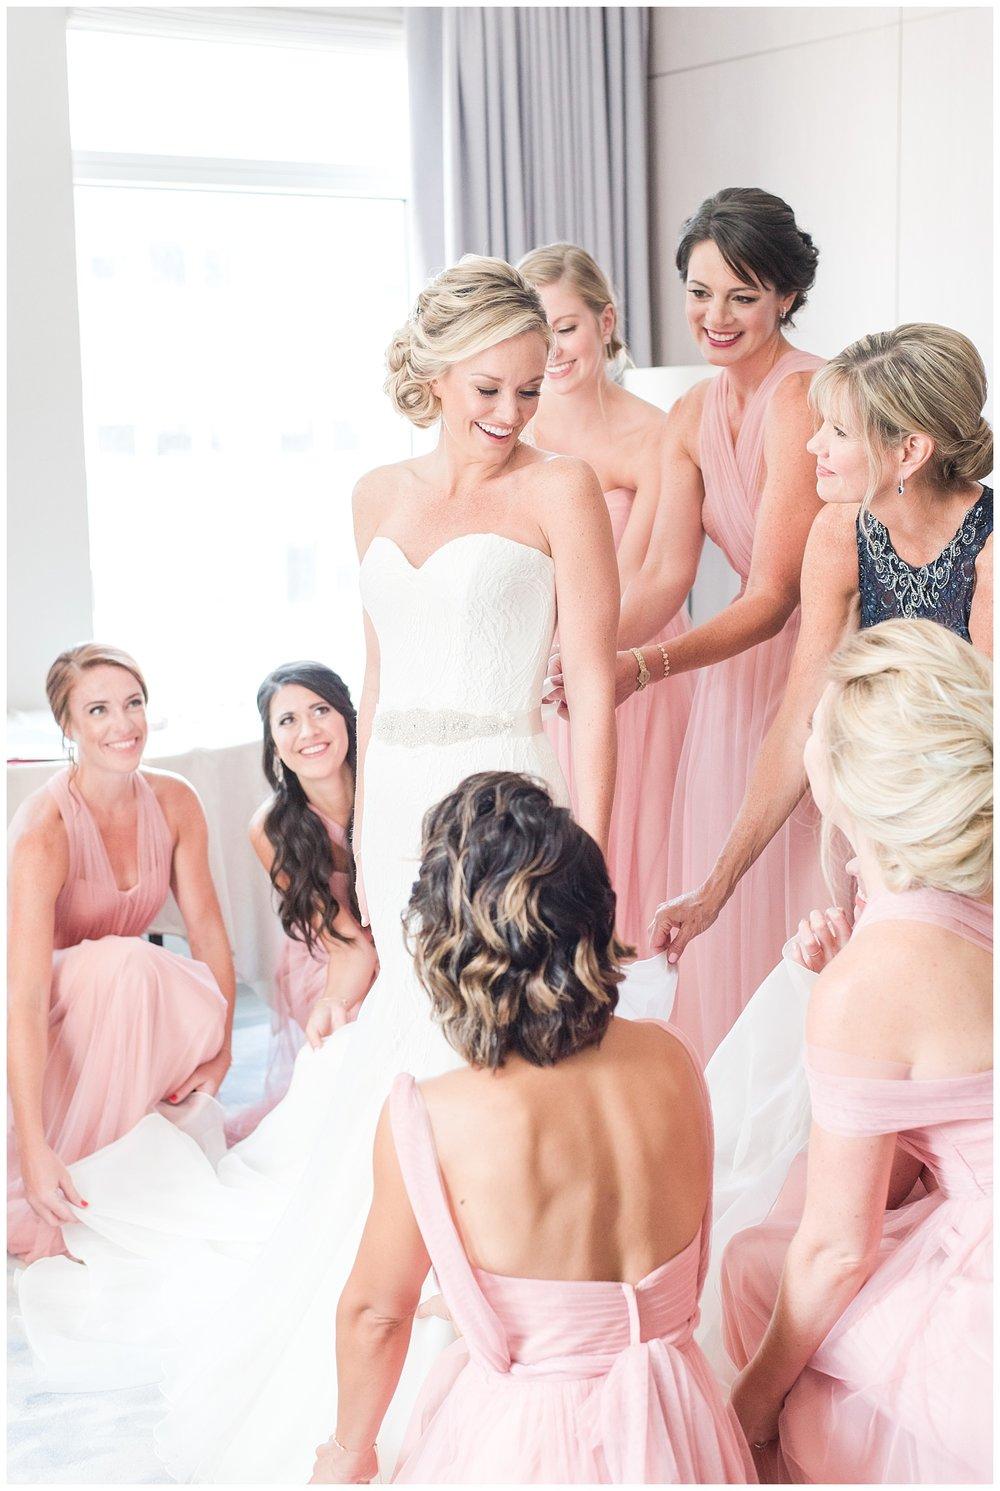 Chelsea_Piers_Lighthouse_Wedding_Fabiana_Skubic_Photography (10).jpg